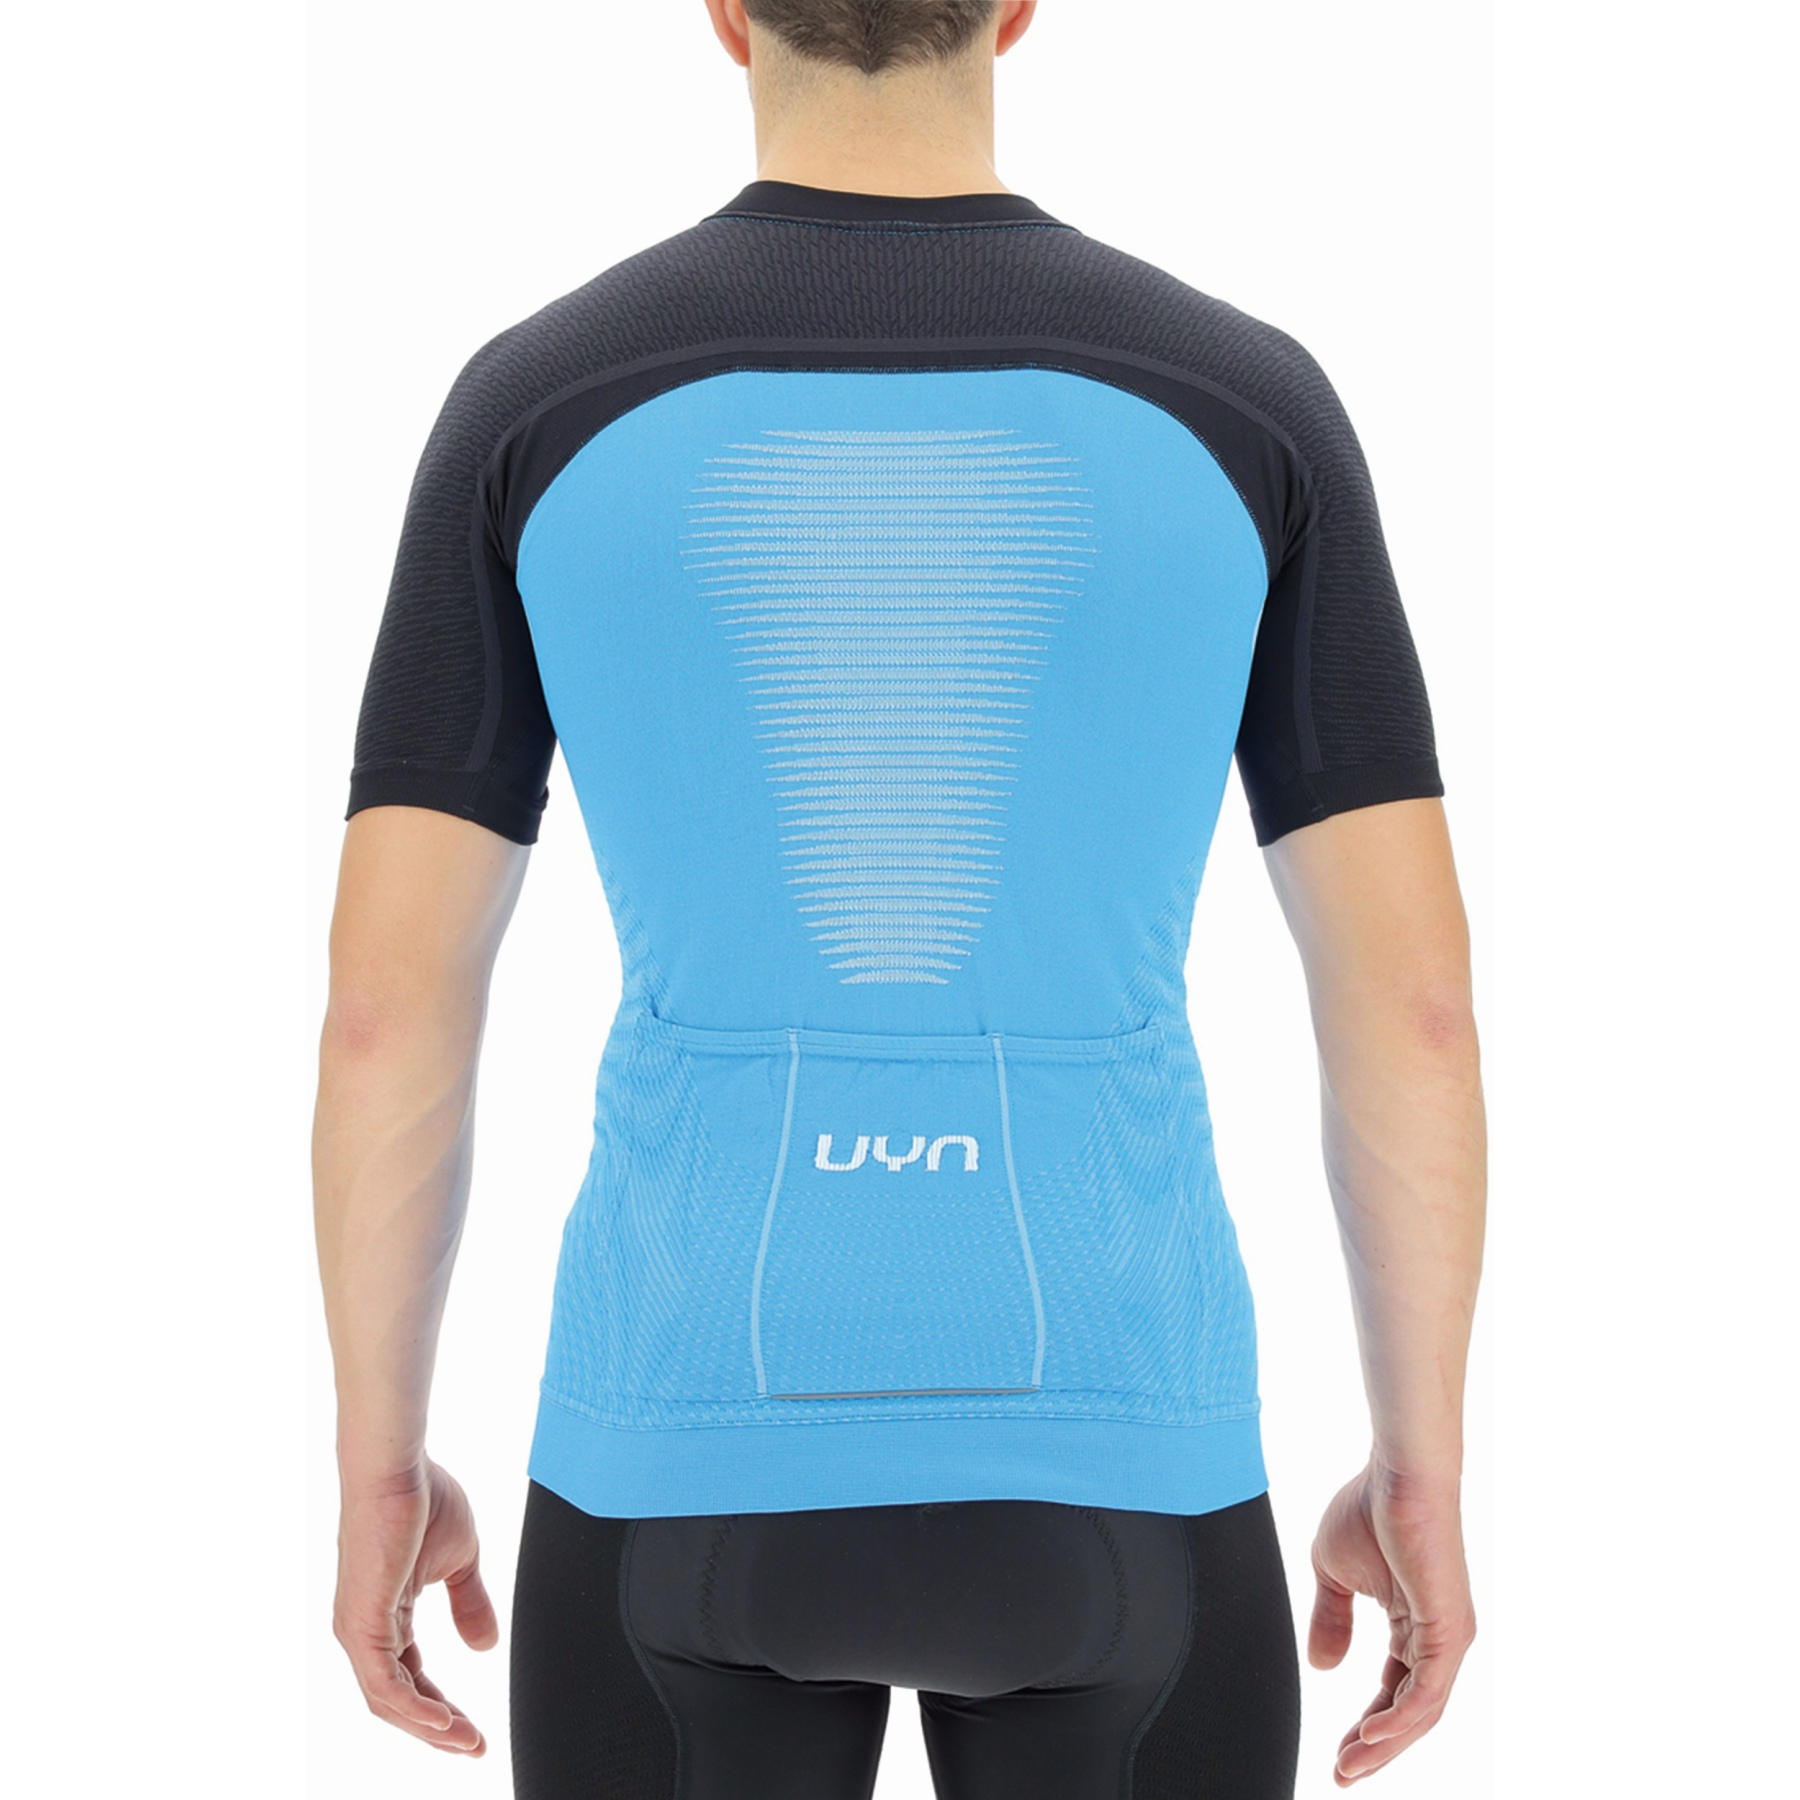 Bild von UYN Biking Granfondo T-Shirt - Danube Blue/Blackboard